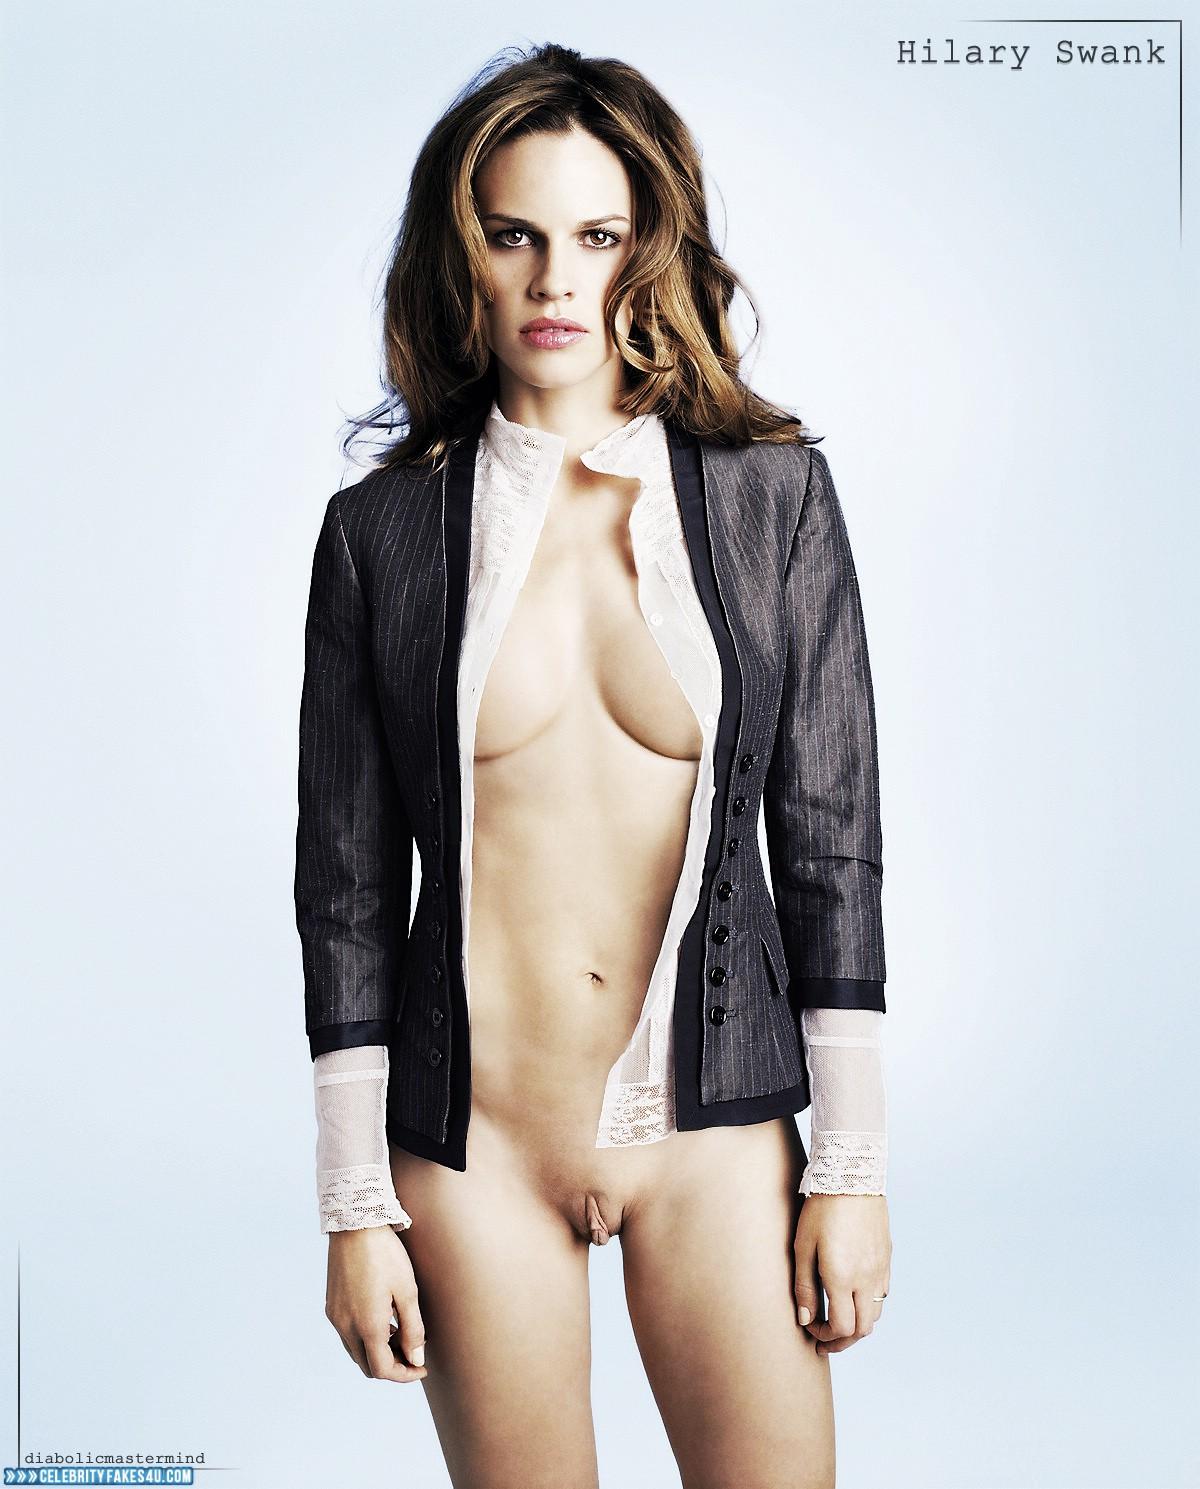 Fake nude images of hilary swank